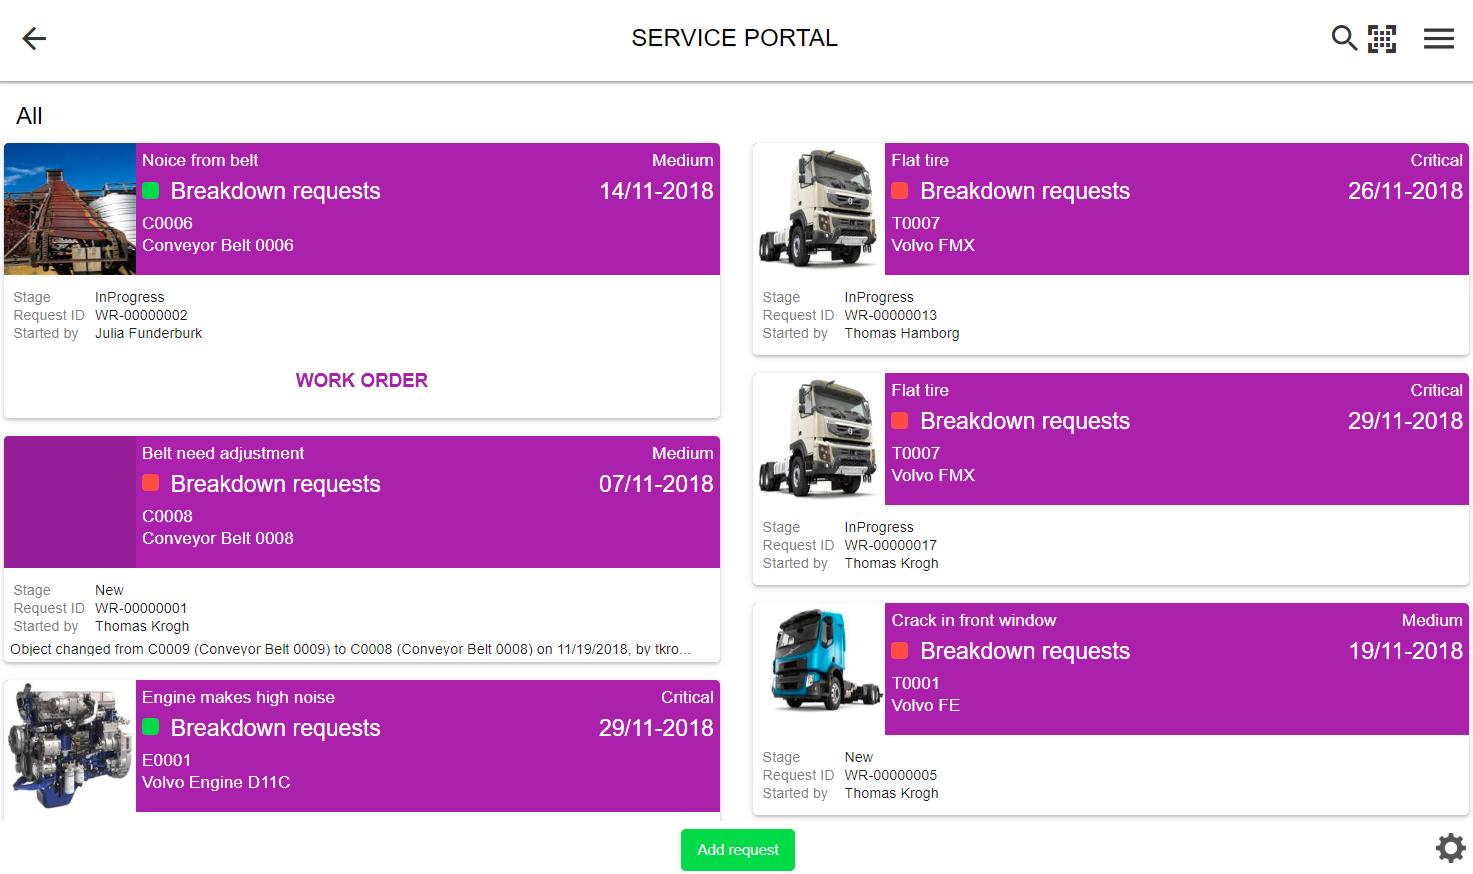 Service portal